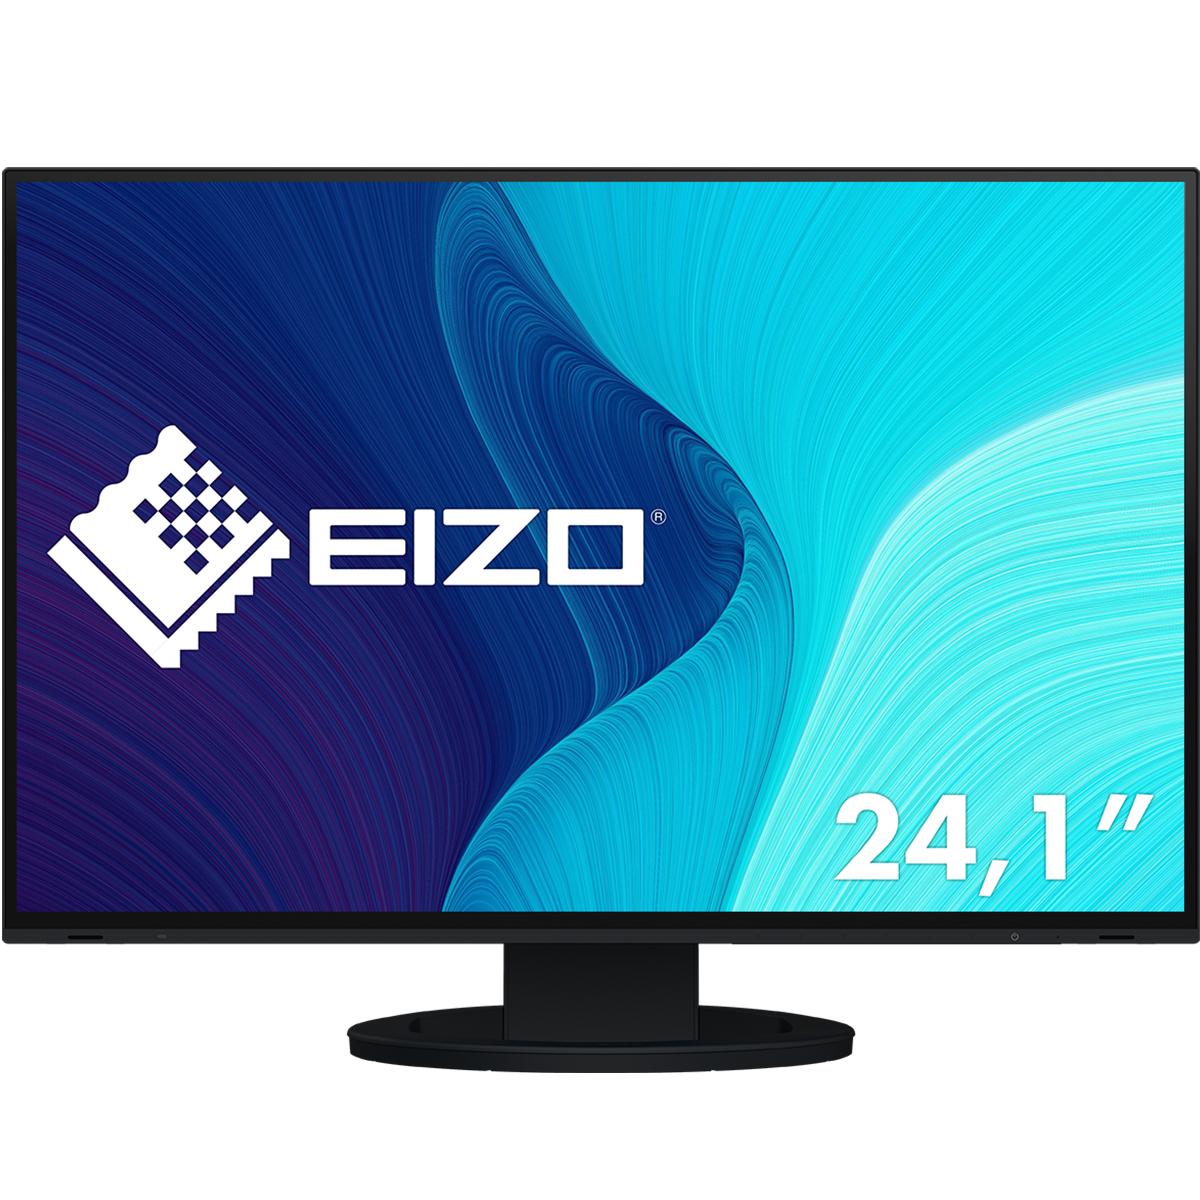 EIZO FlexScan EV2495-BK computer monitor 61.2 cm (24.1